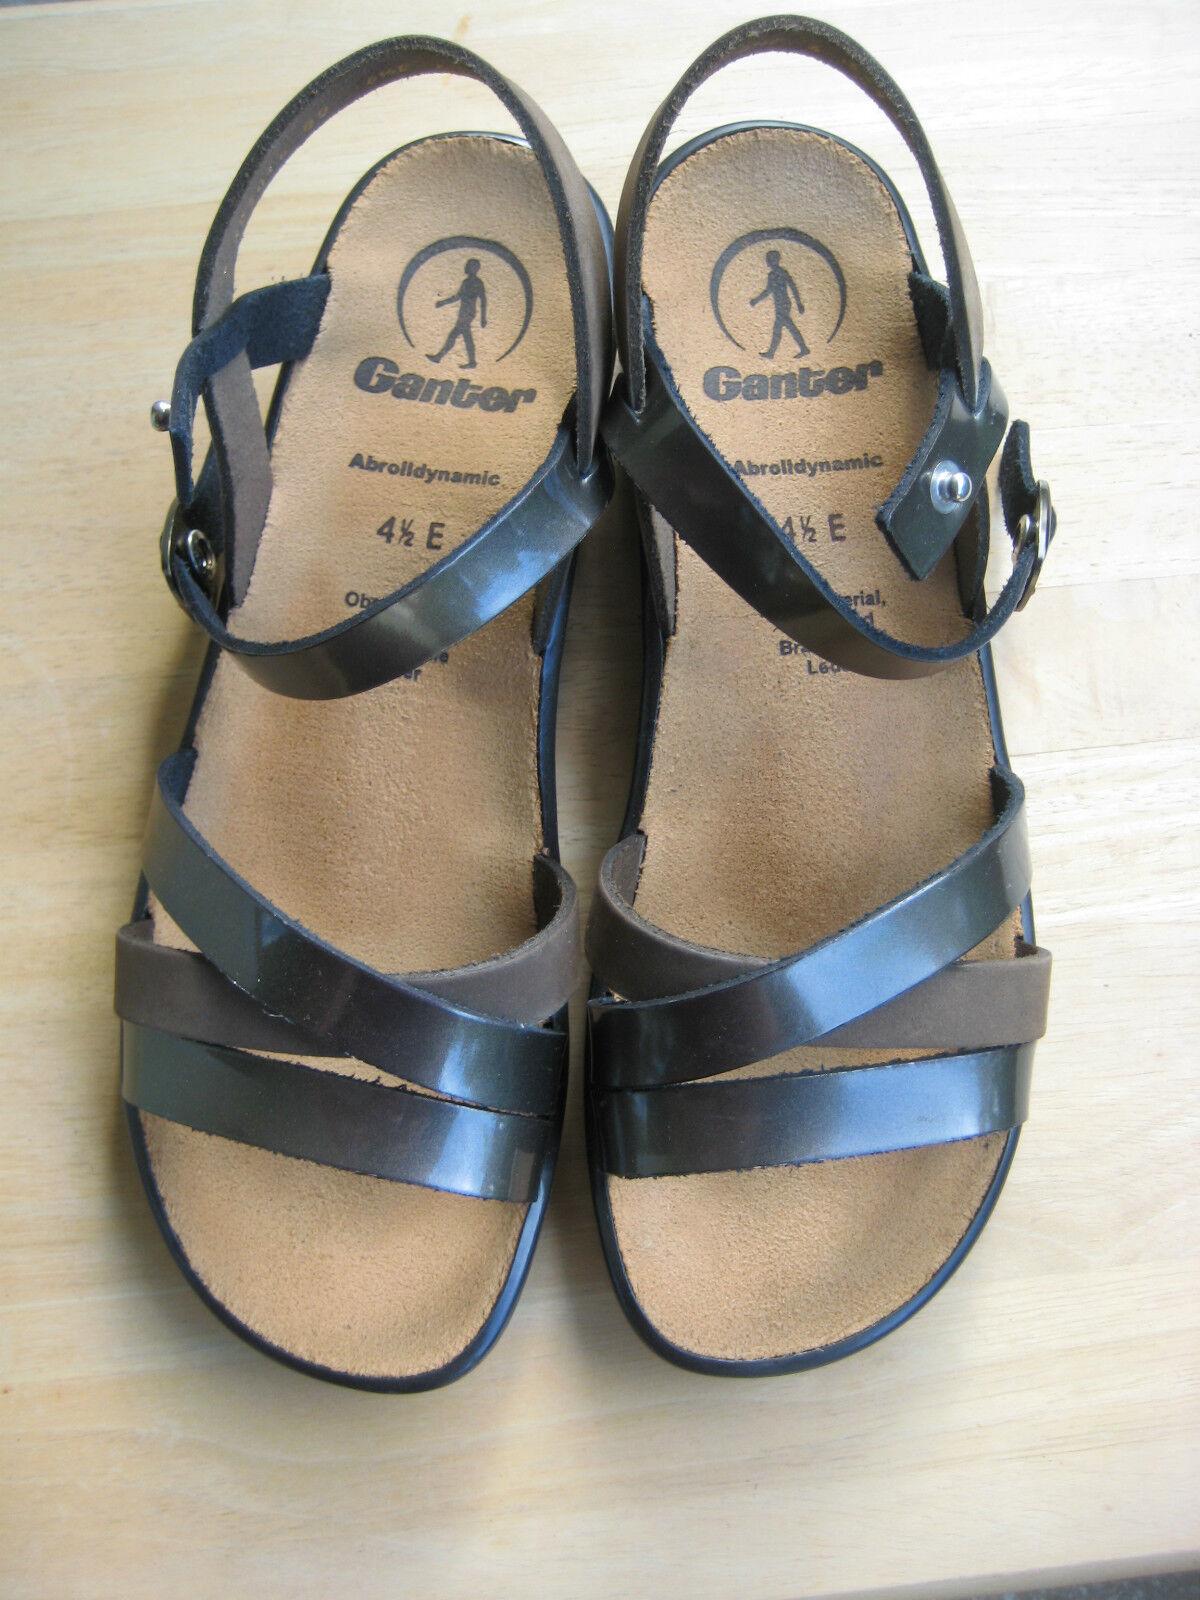 Ganter  Sandale Größe 4,5- braun/metallic